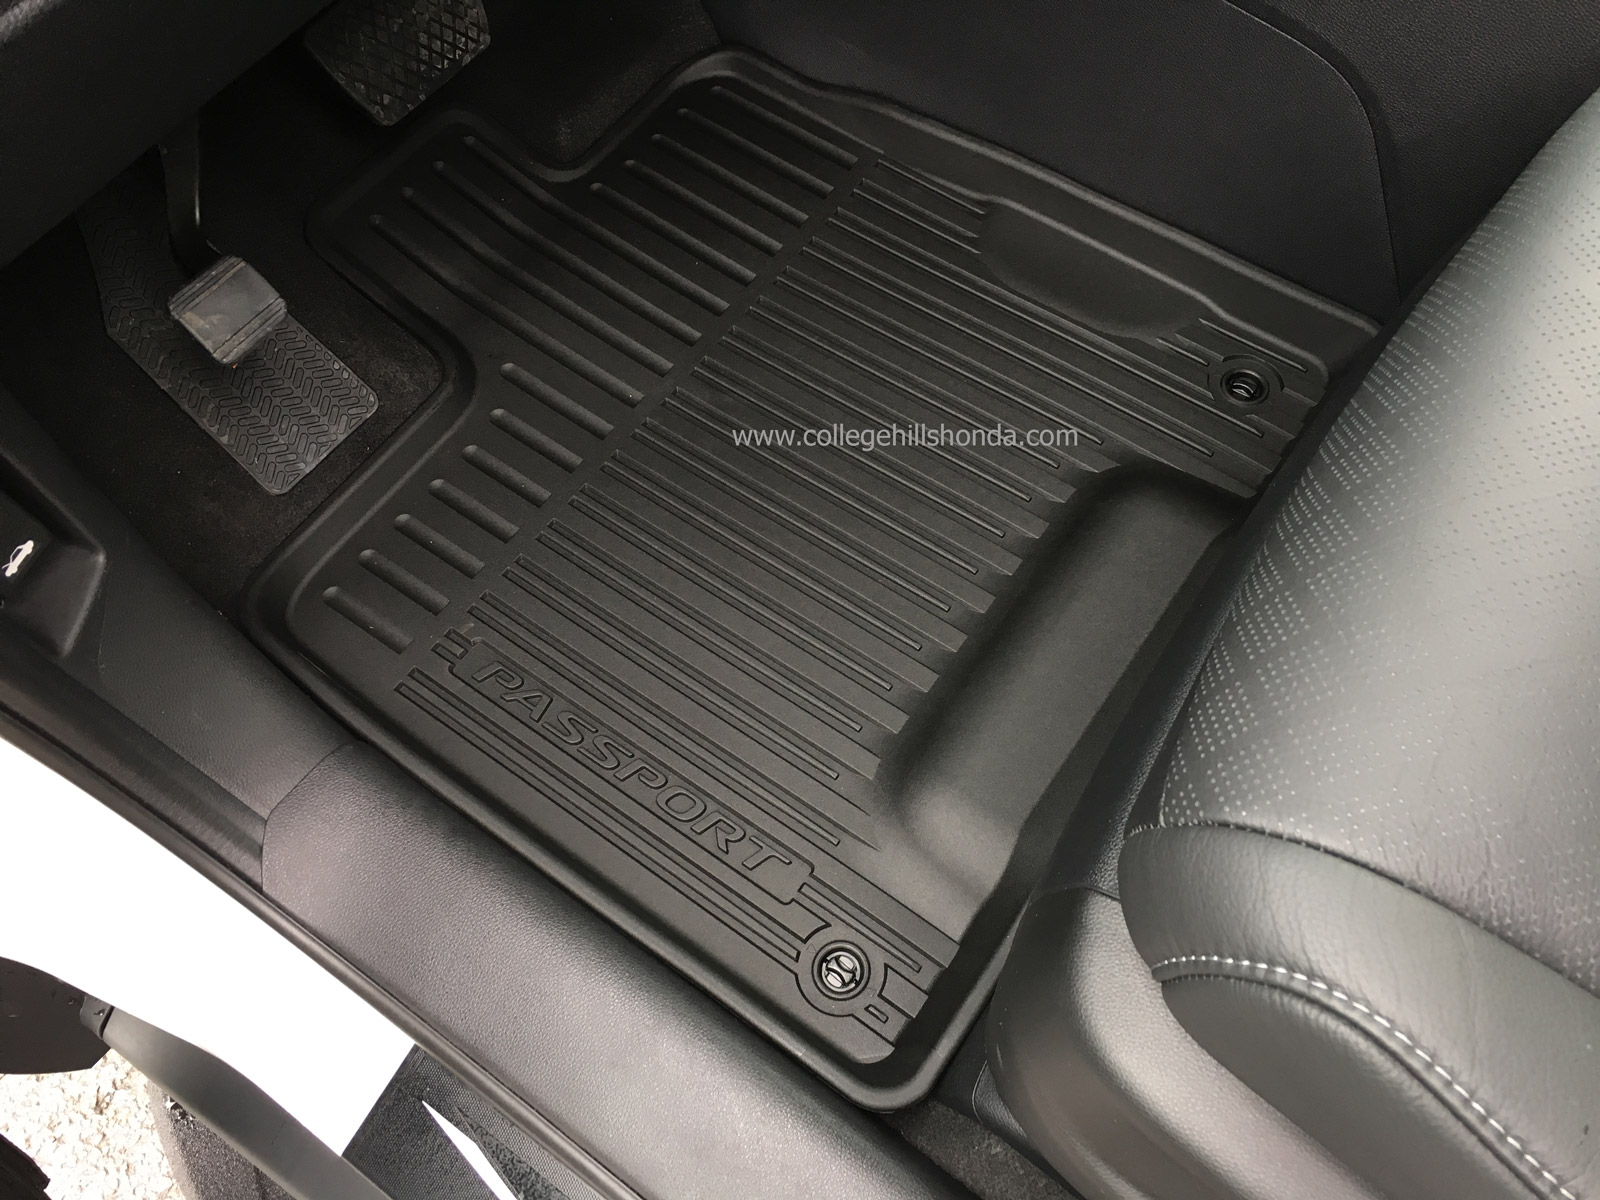 Honda Civic Aftermarket Parts >> 2019-2020 Honda Passport All Season Floor Mats - 08P17-TGS-100